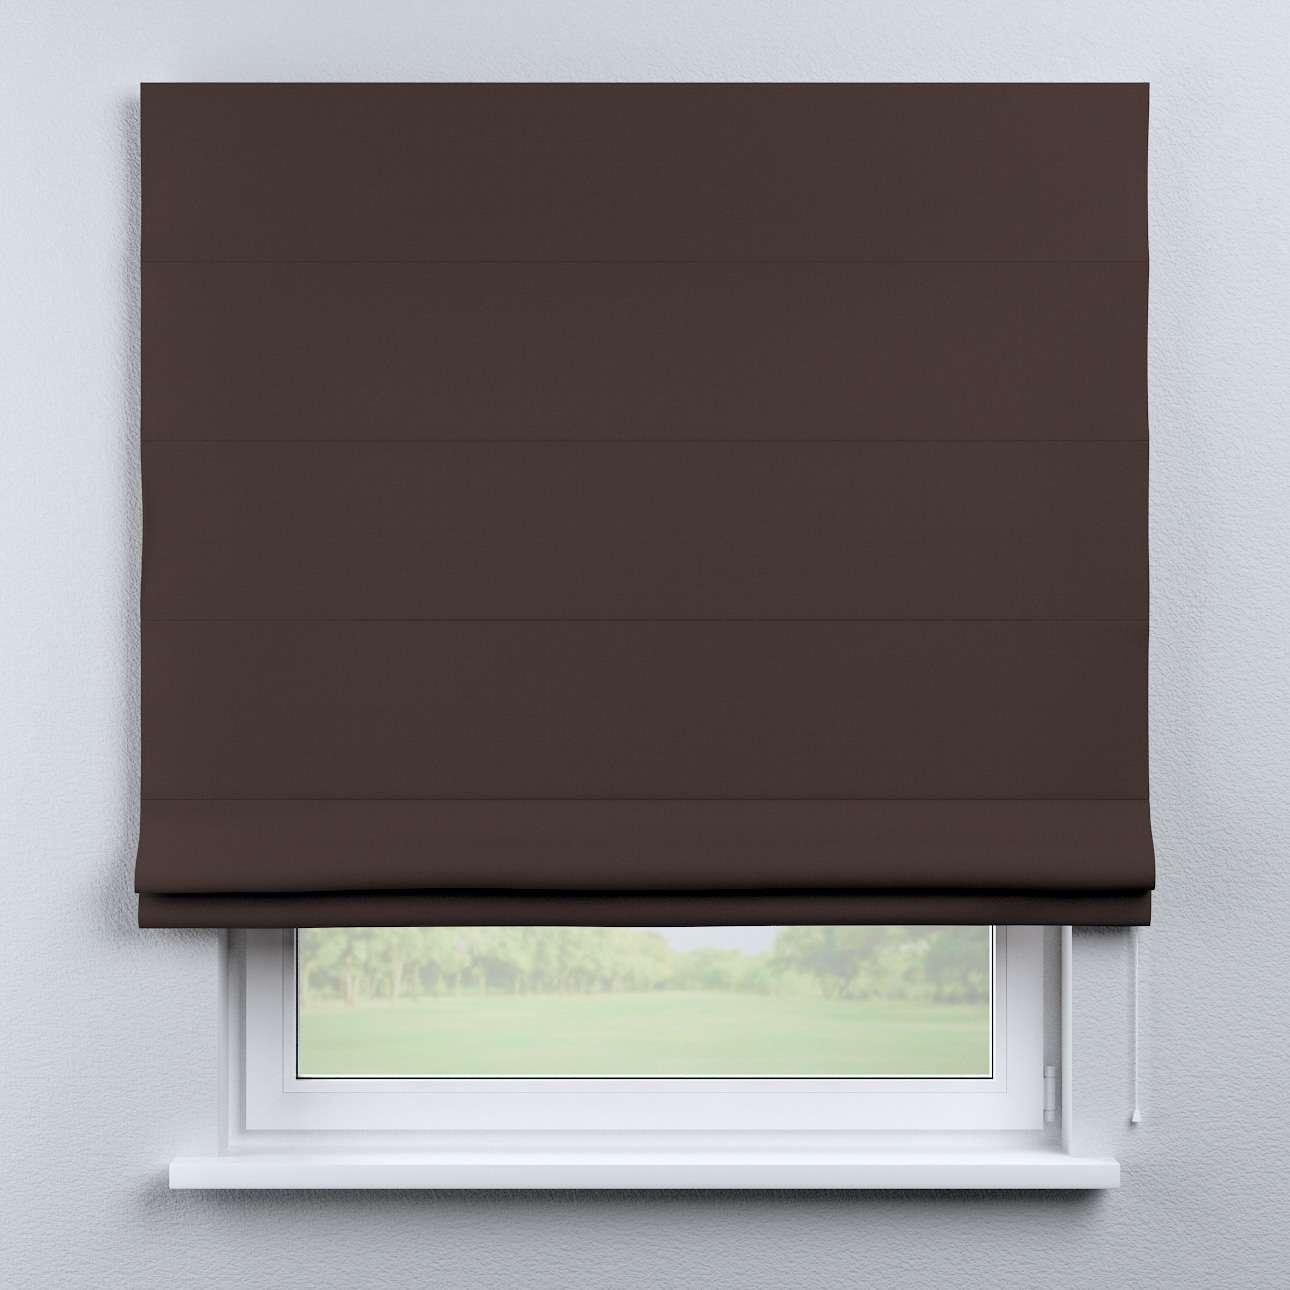 Foldegardin Capri<br/>Uden flæsekant 80 x 170 cm fra kollektionen Cotton Panama, Stof: 702-03